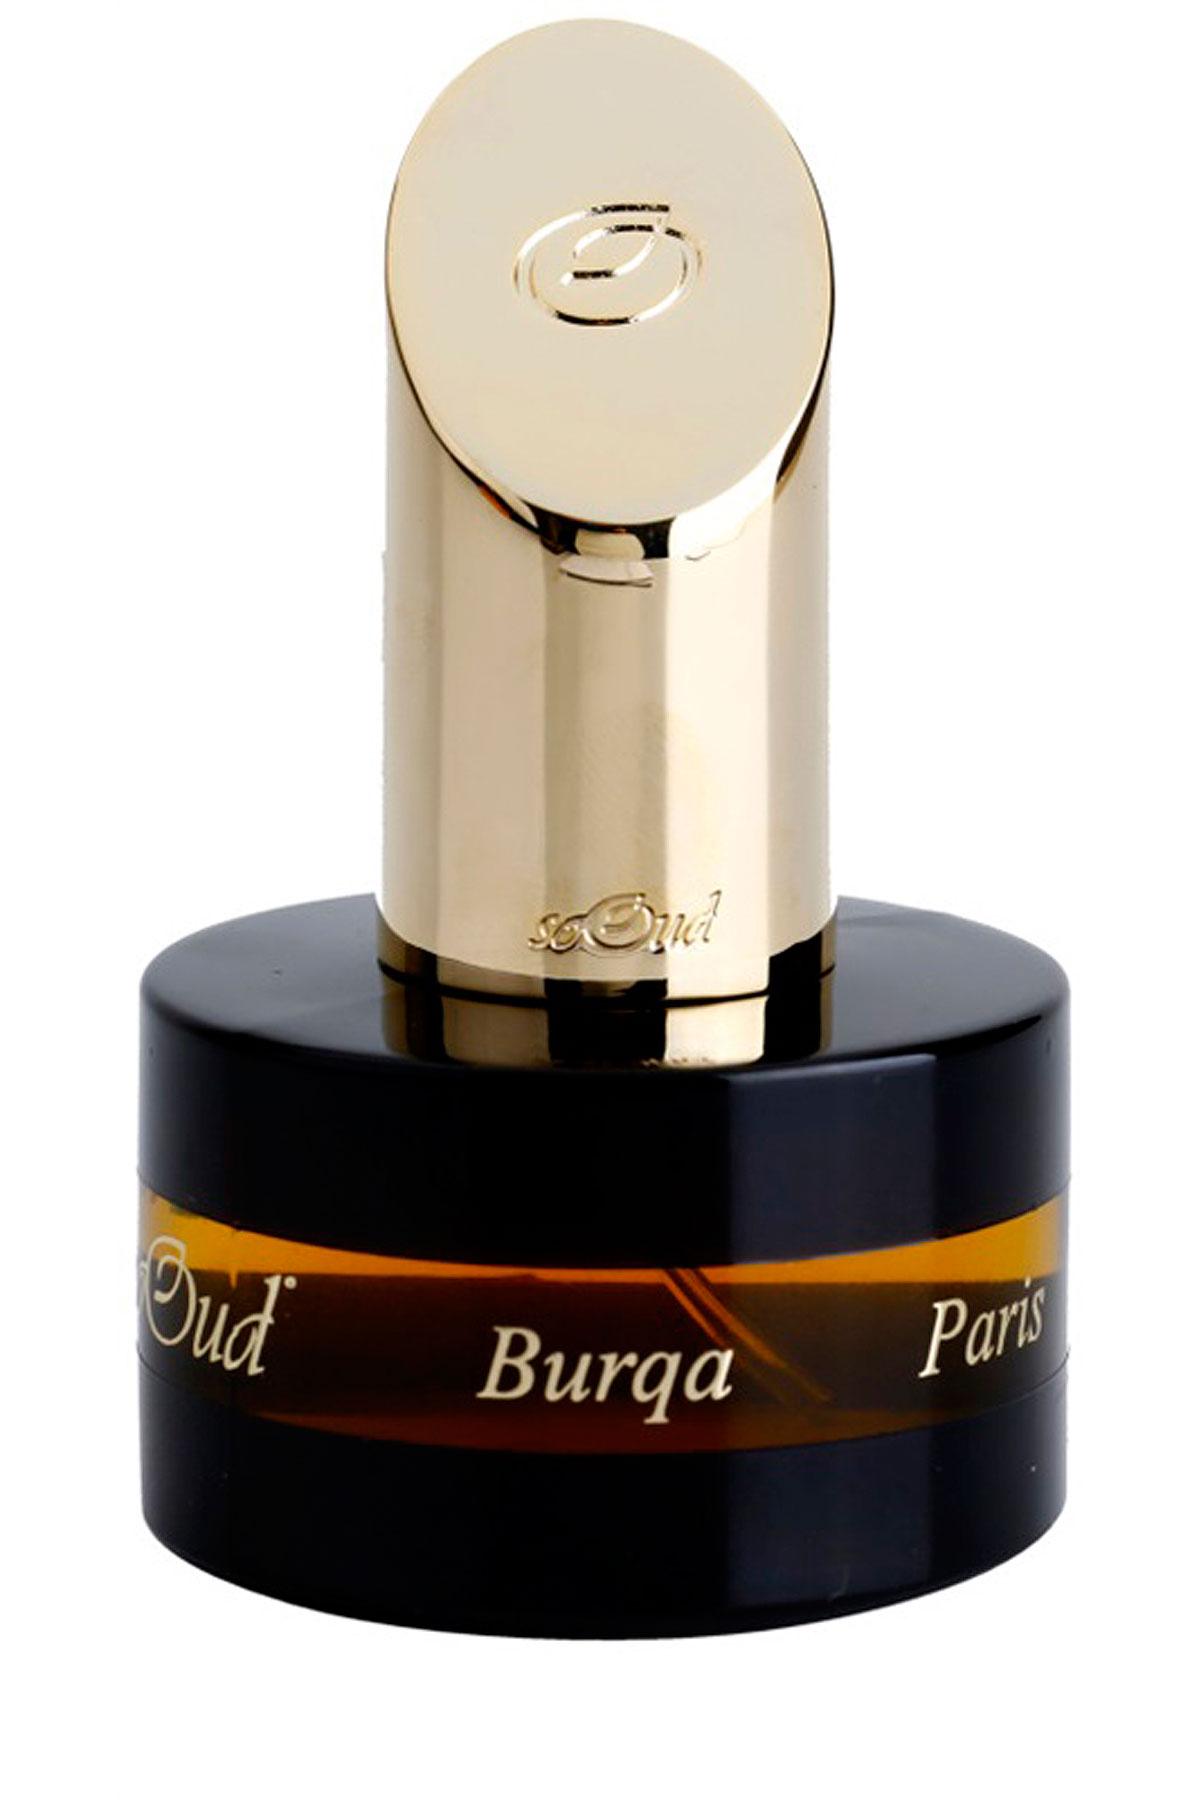 SoOud Fragrances for Women, Burqa - Parfume Nektar - 30 Ml, 2019, 30 ml